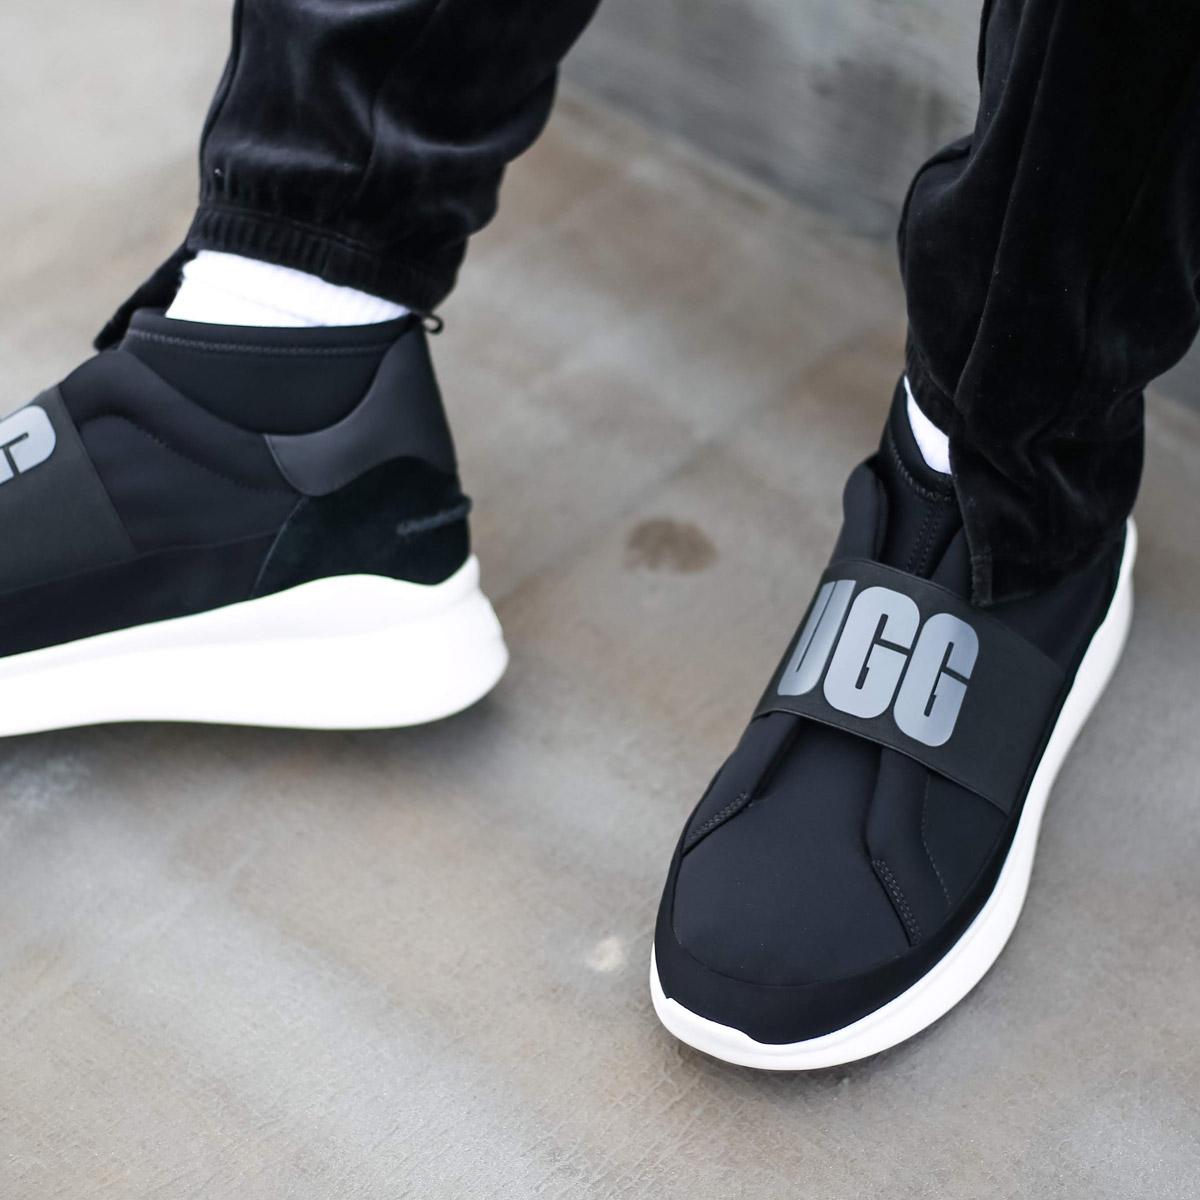 UGG Neutra Sneaker (アグ ニュートラ スニーカー)BLACK【レディース スニーカー】19SS-I